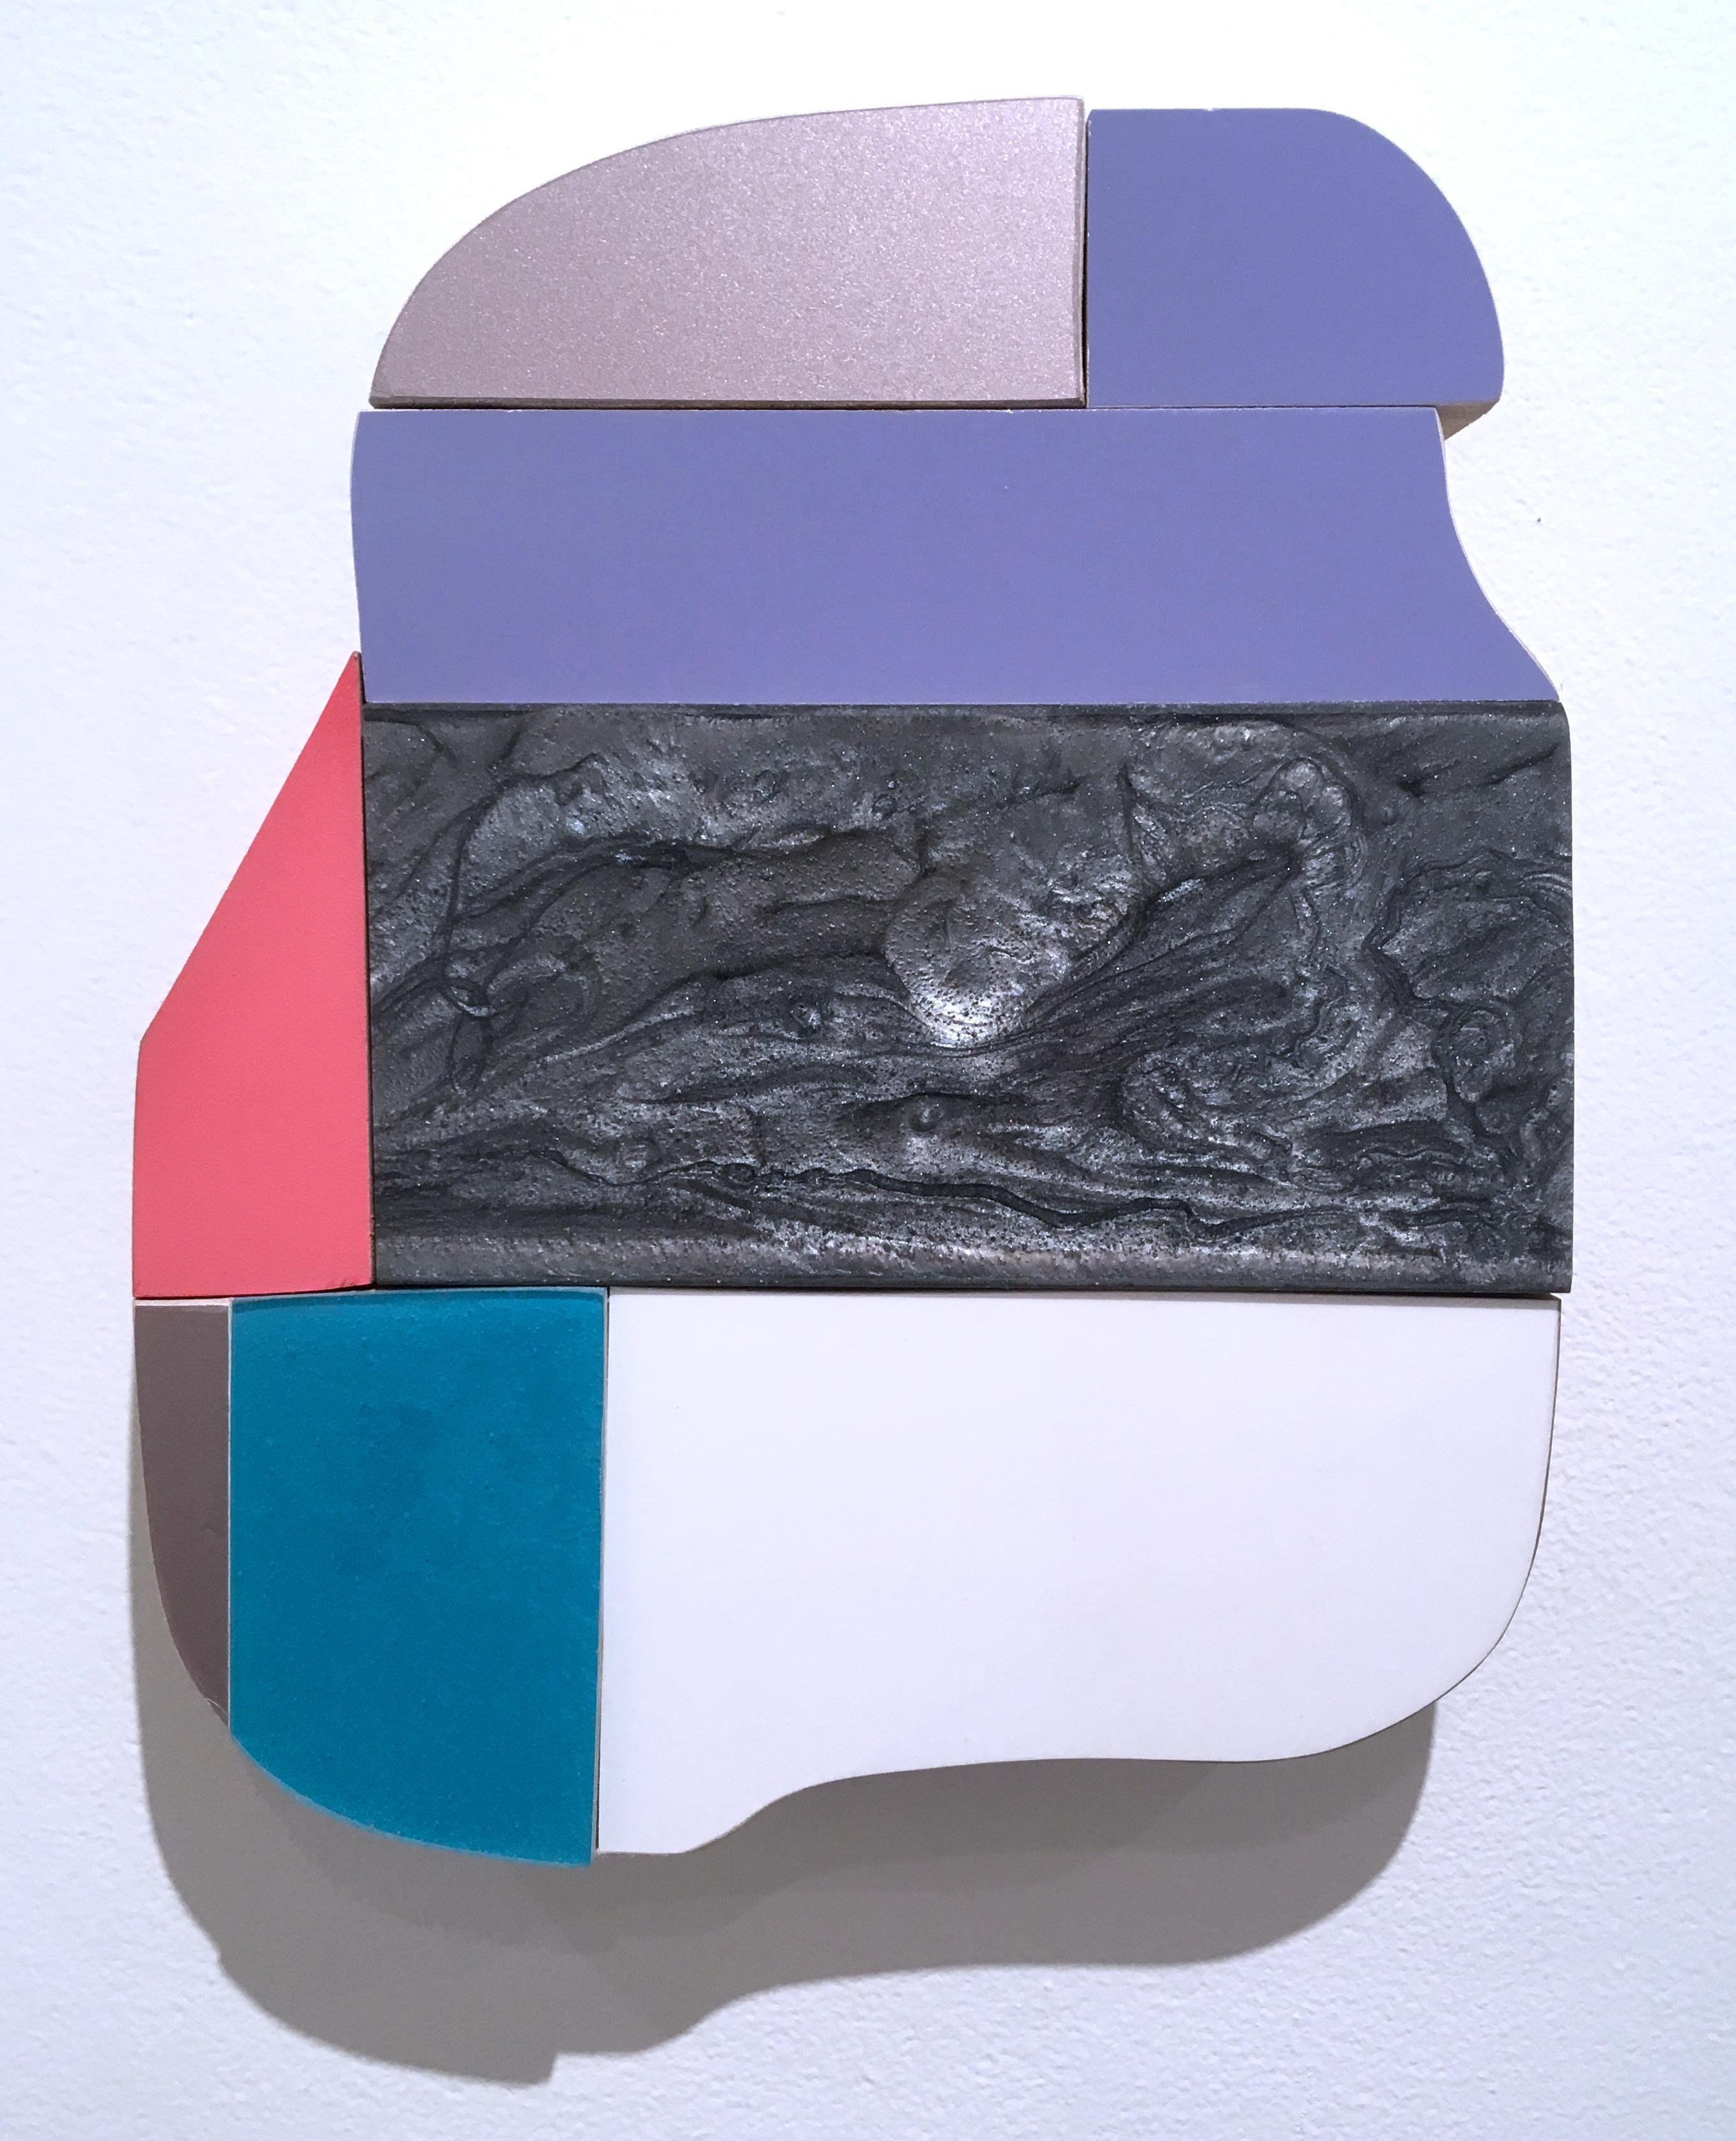 Marble, wall sculpture,  liquid plastic, acrylic, wood, abstract geometric